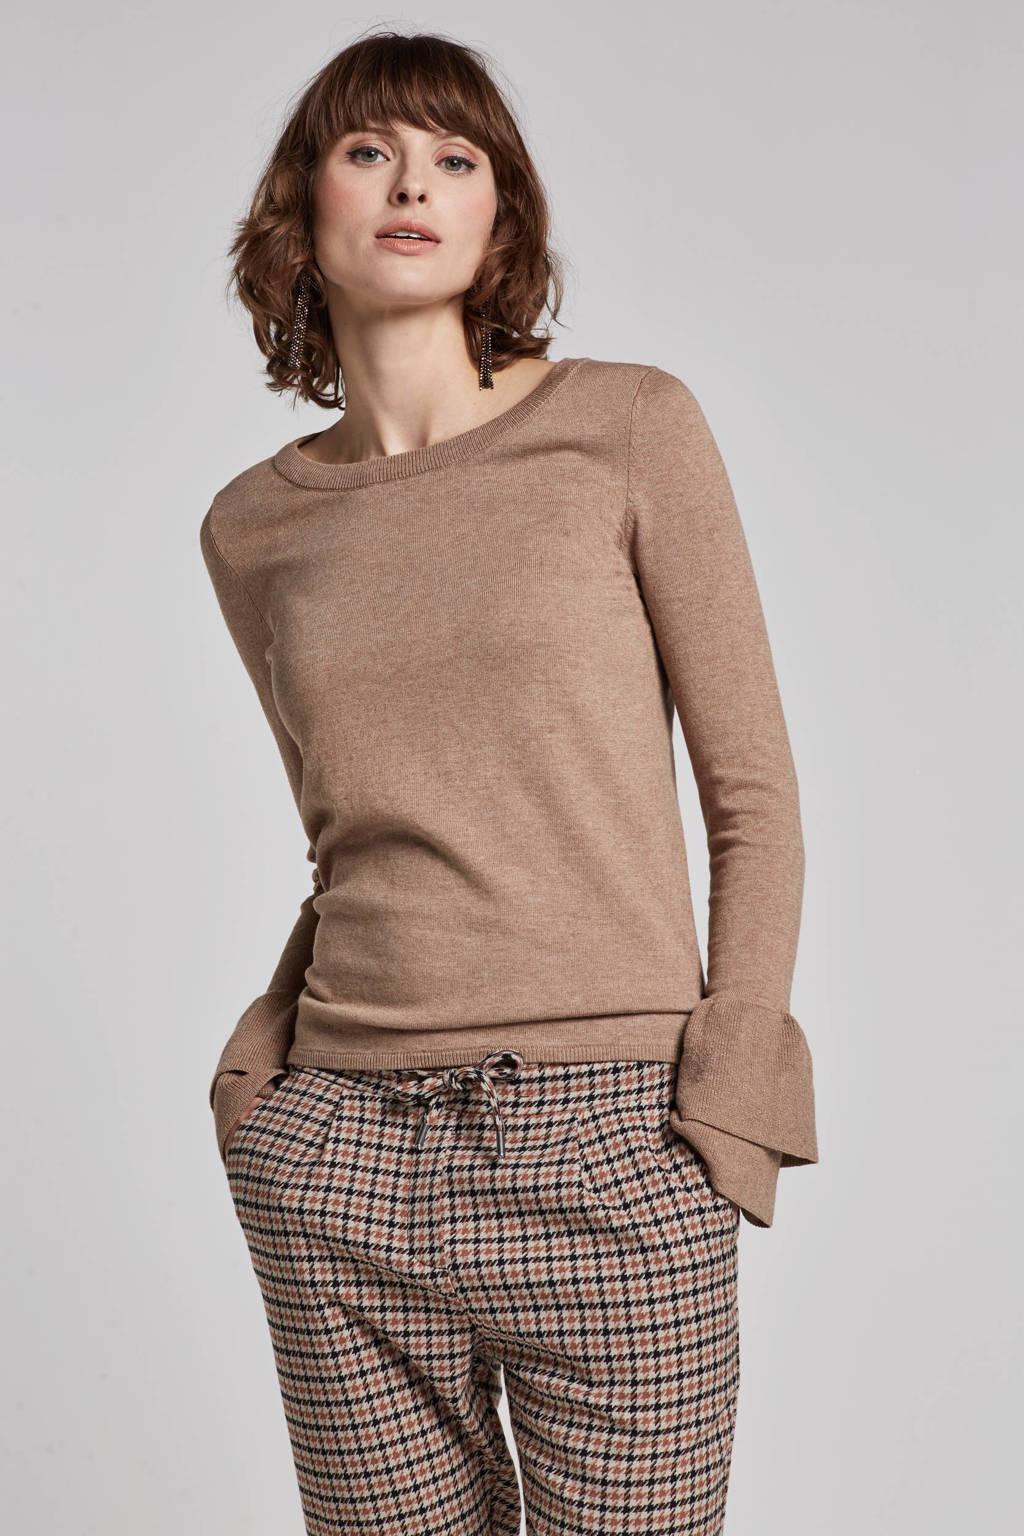 whkmp's own fijnbrei trui met rushes, Beige